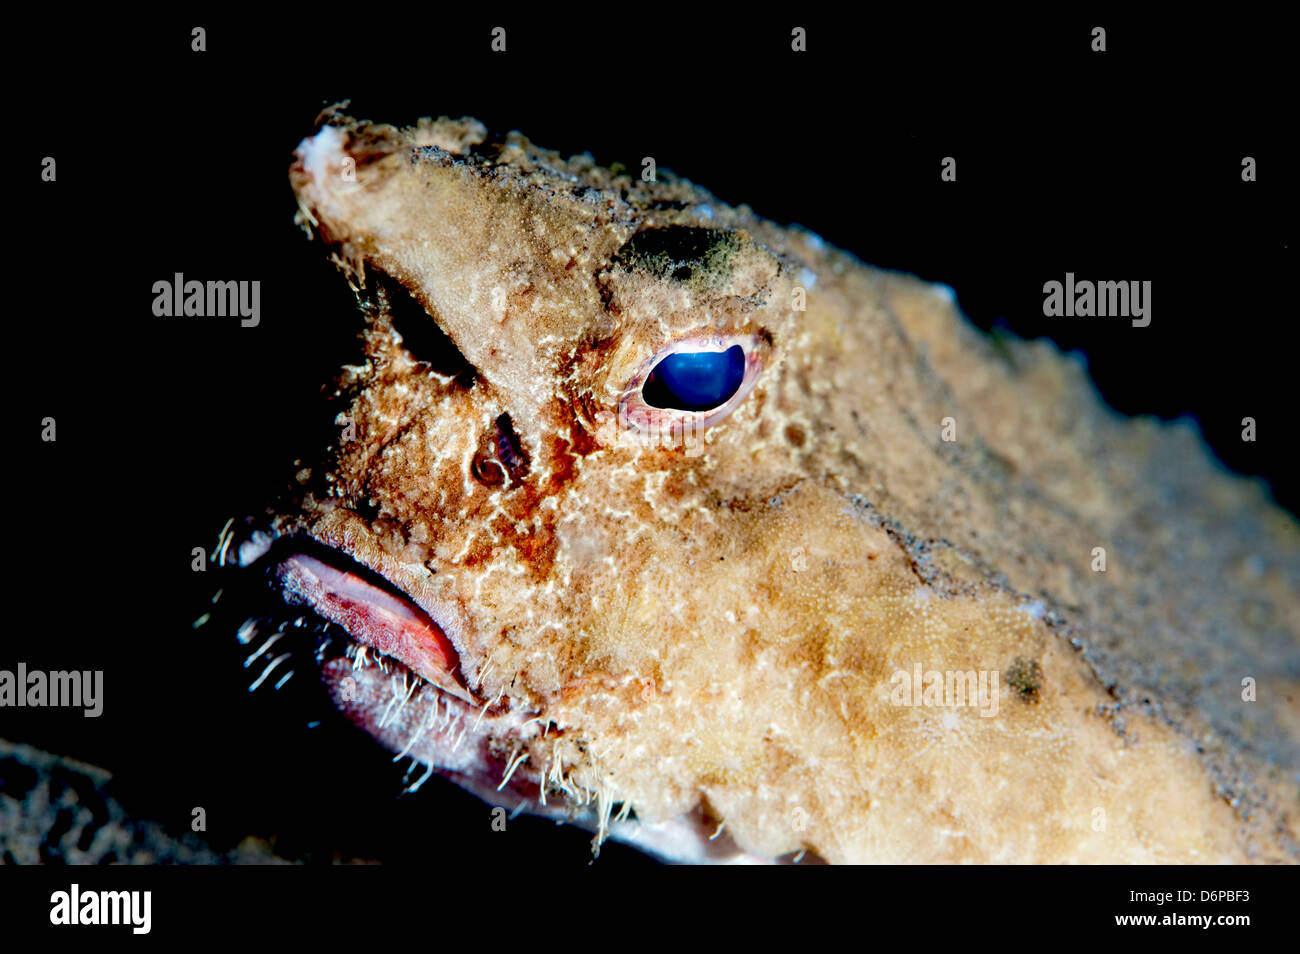 Un raro longnose caminar batfish (Ogcocephalus corniger) que normalmente vive en profundidades de hasta 300m, Dominica, Imagen De Stock